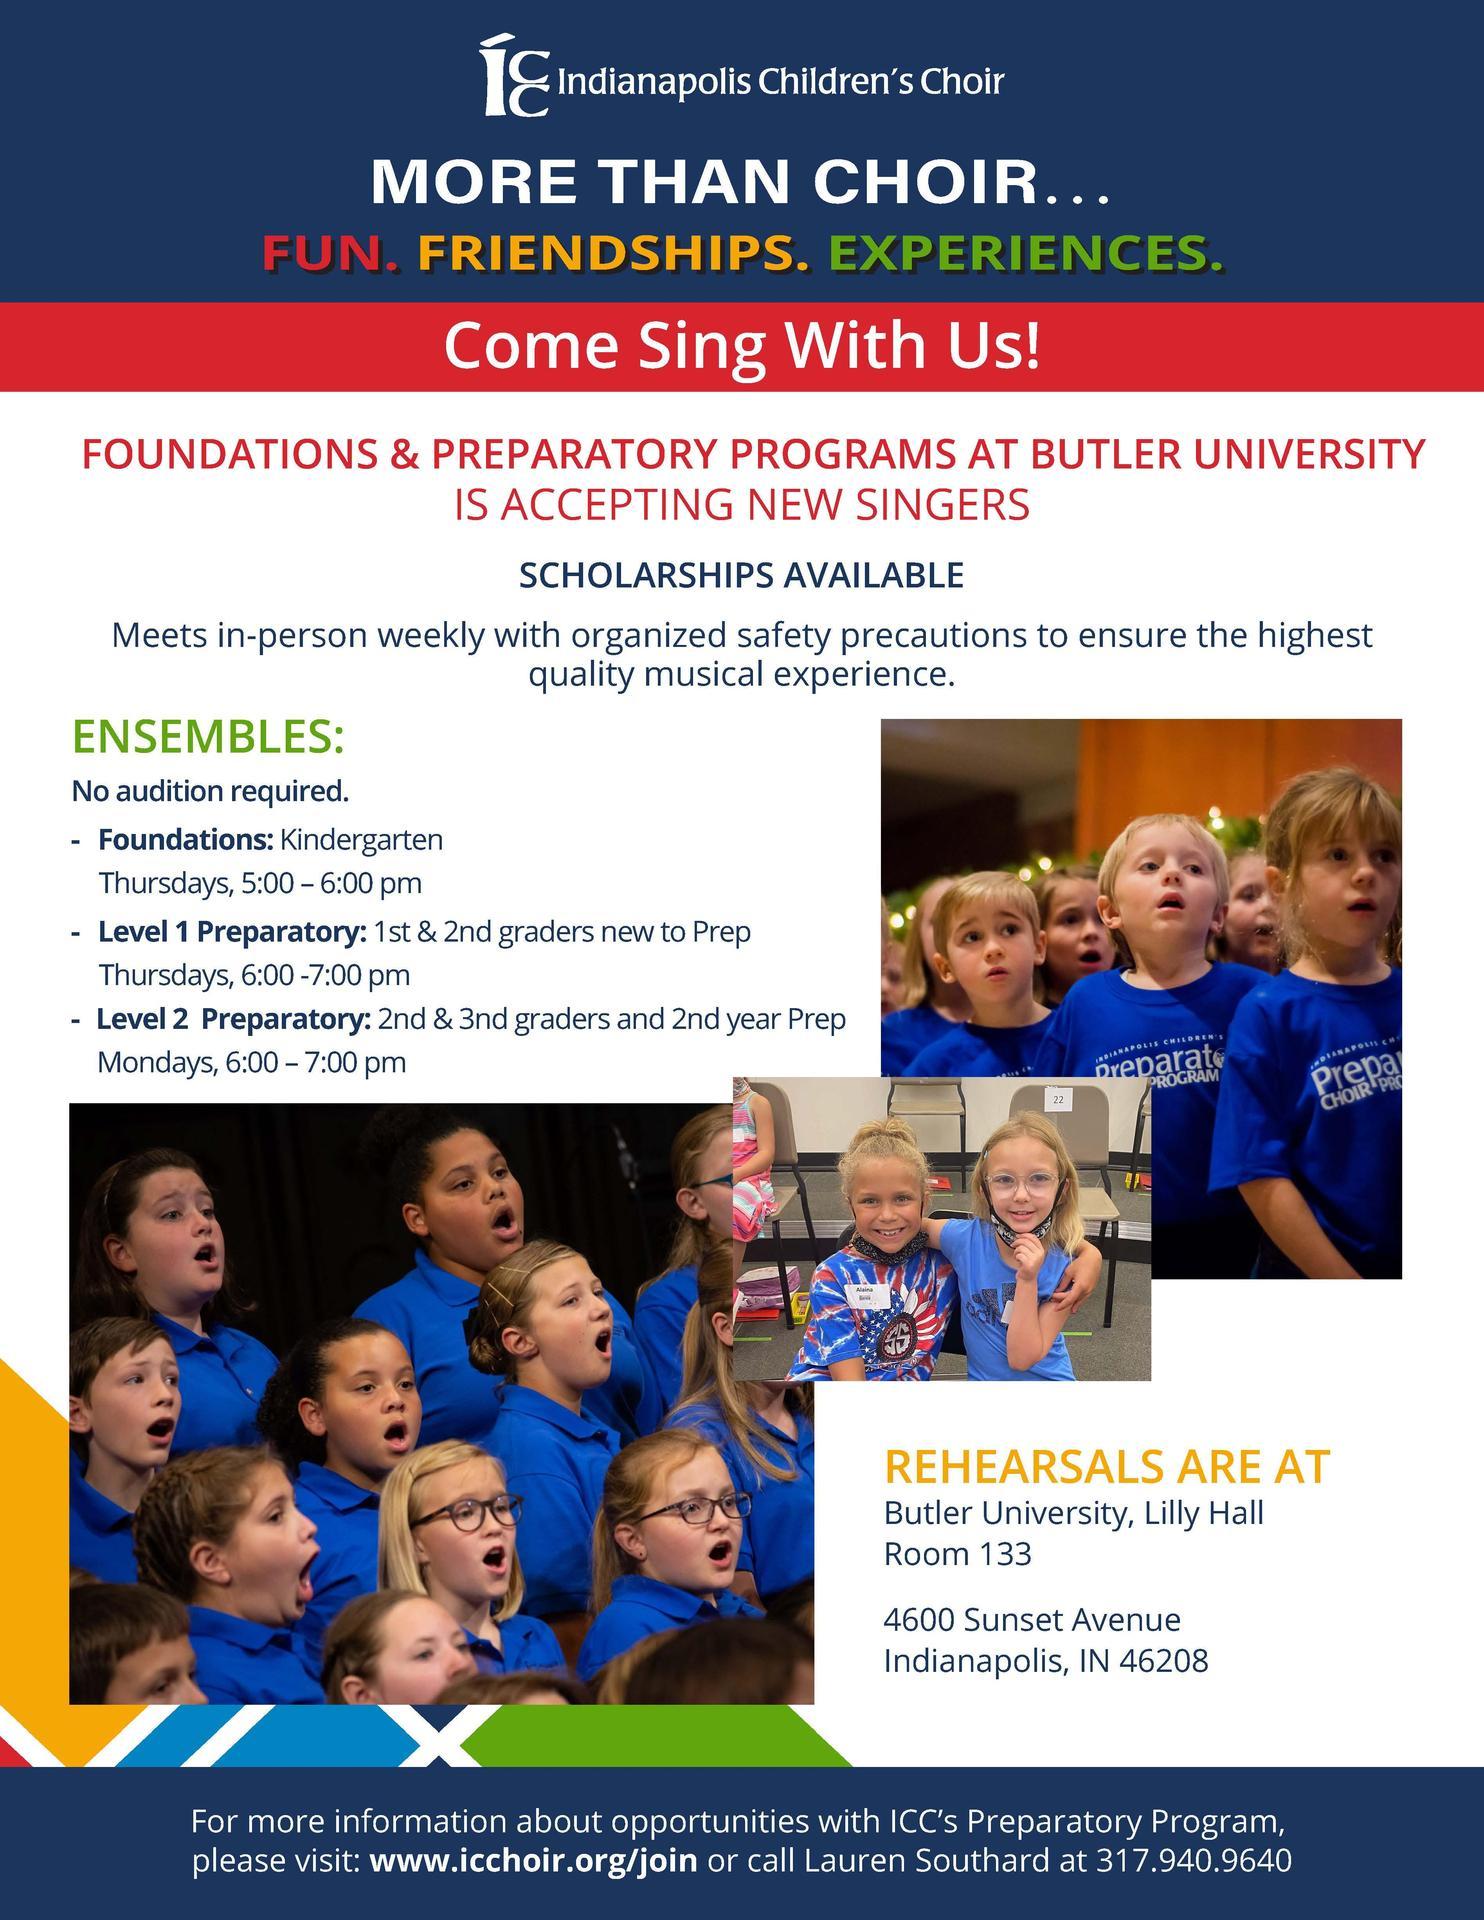 Indianapolis Children's Choir